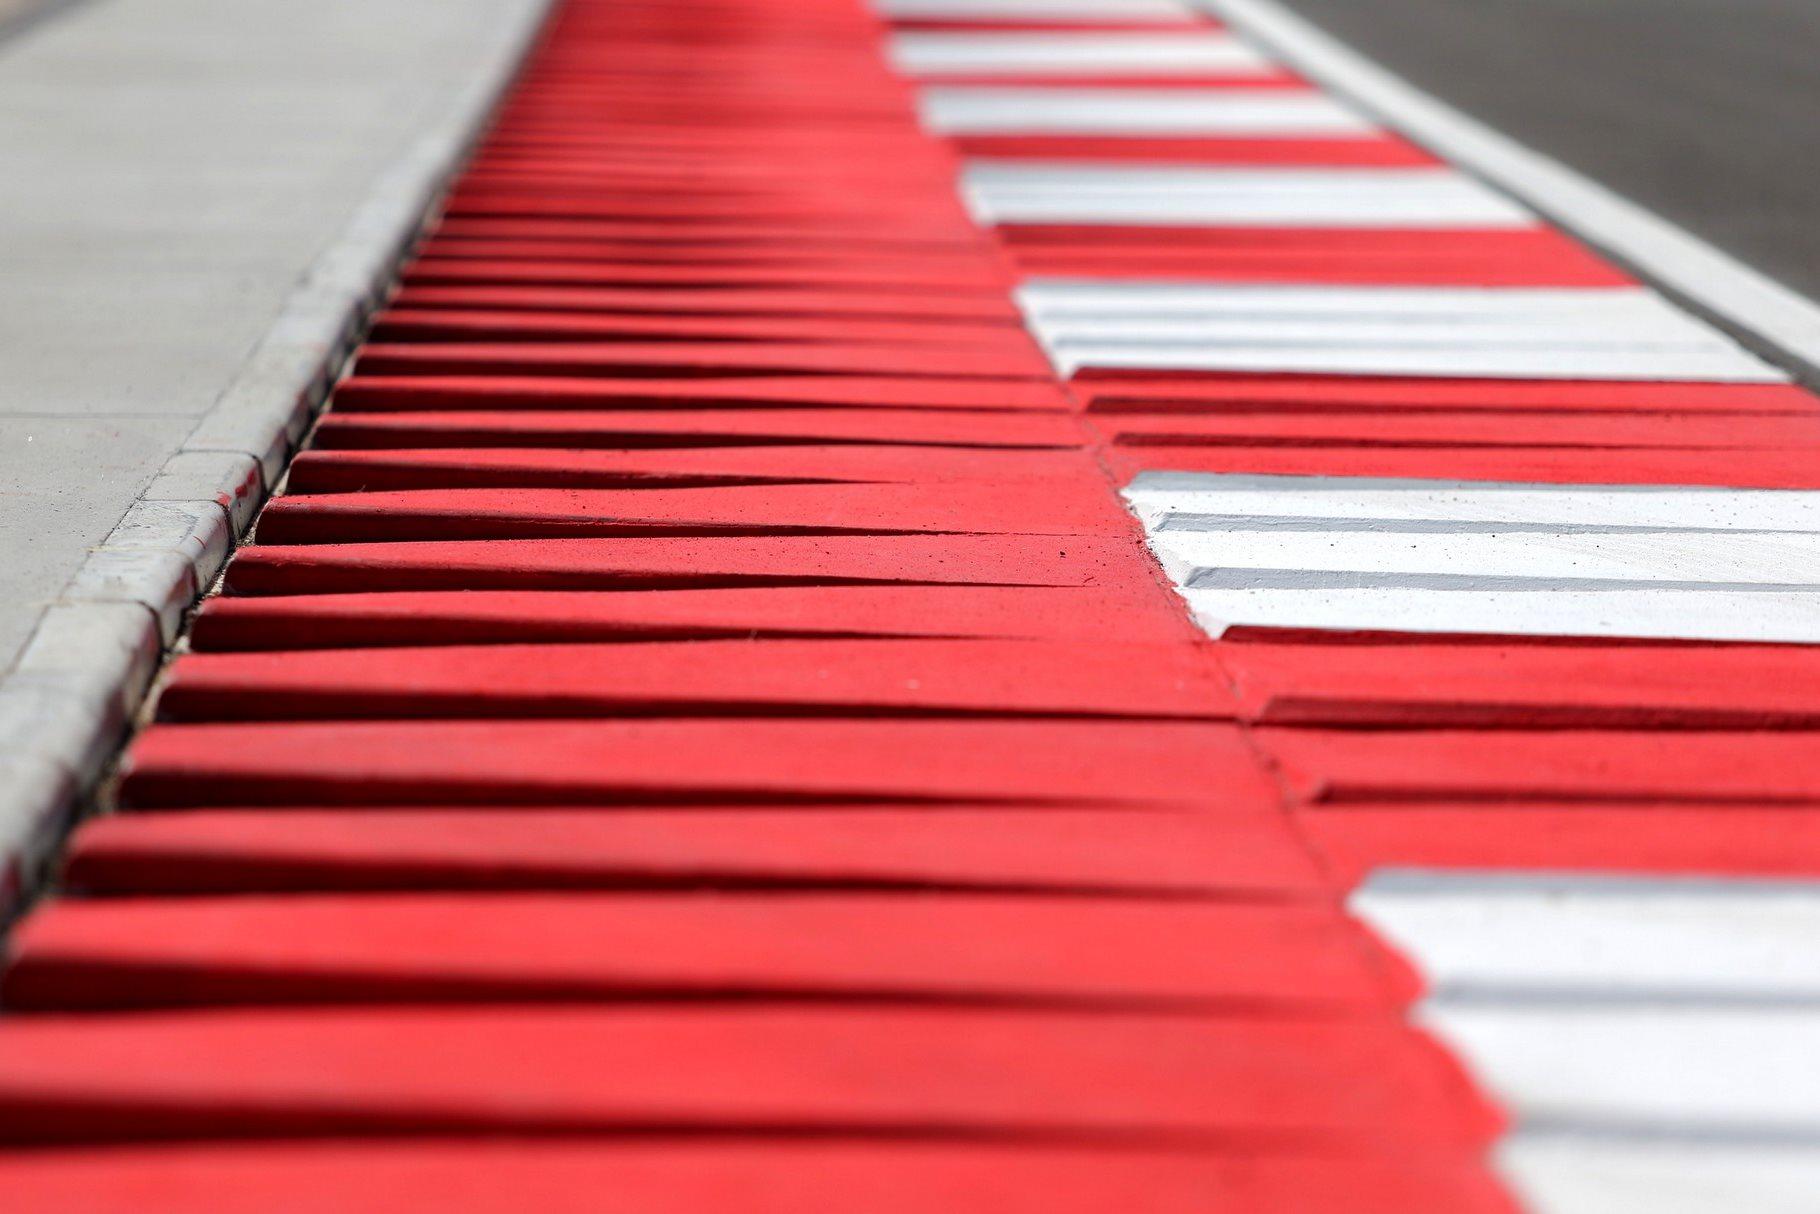 F1, f1 news, f1 analysis, autosport, ian parkes